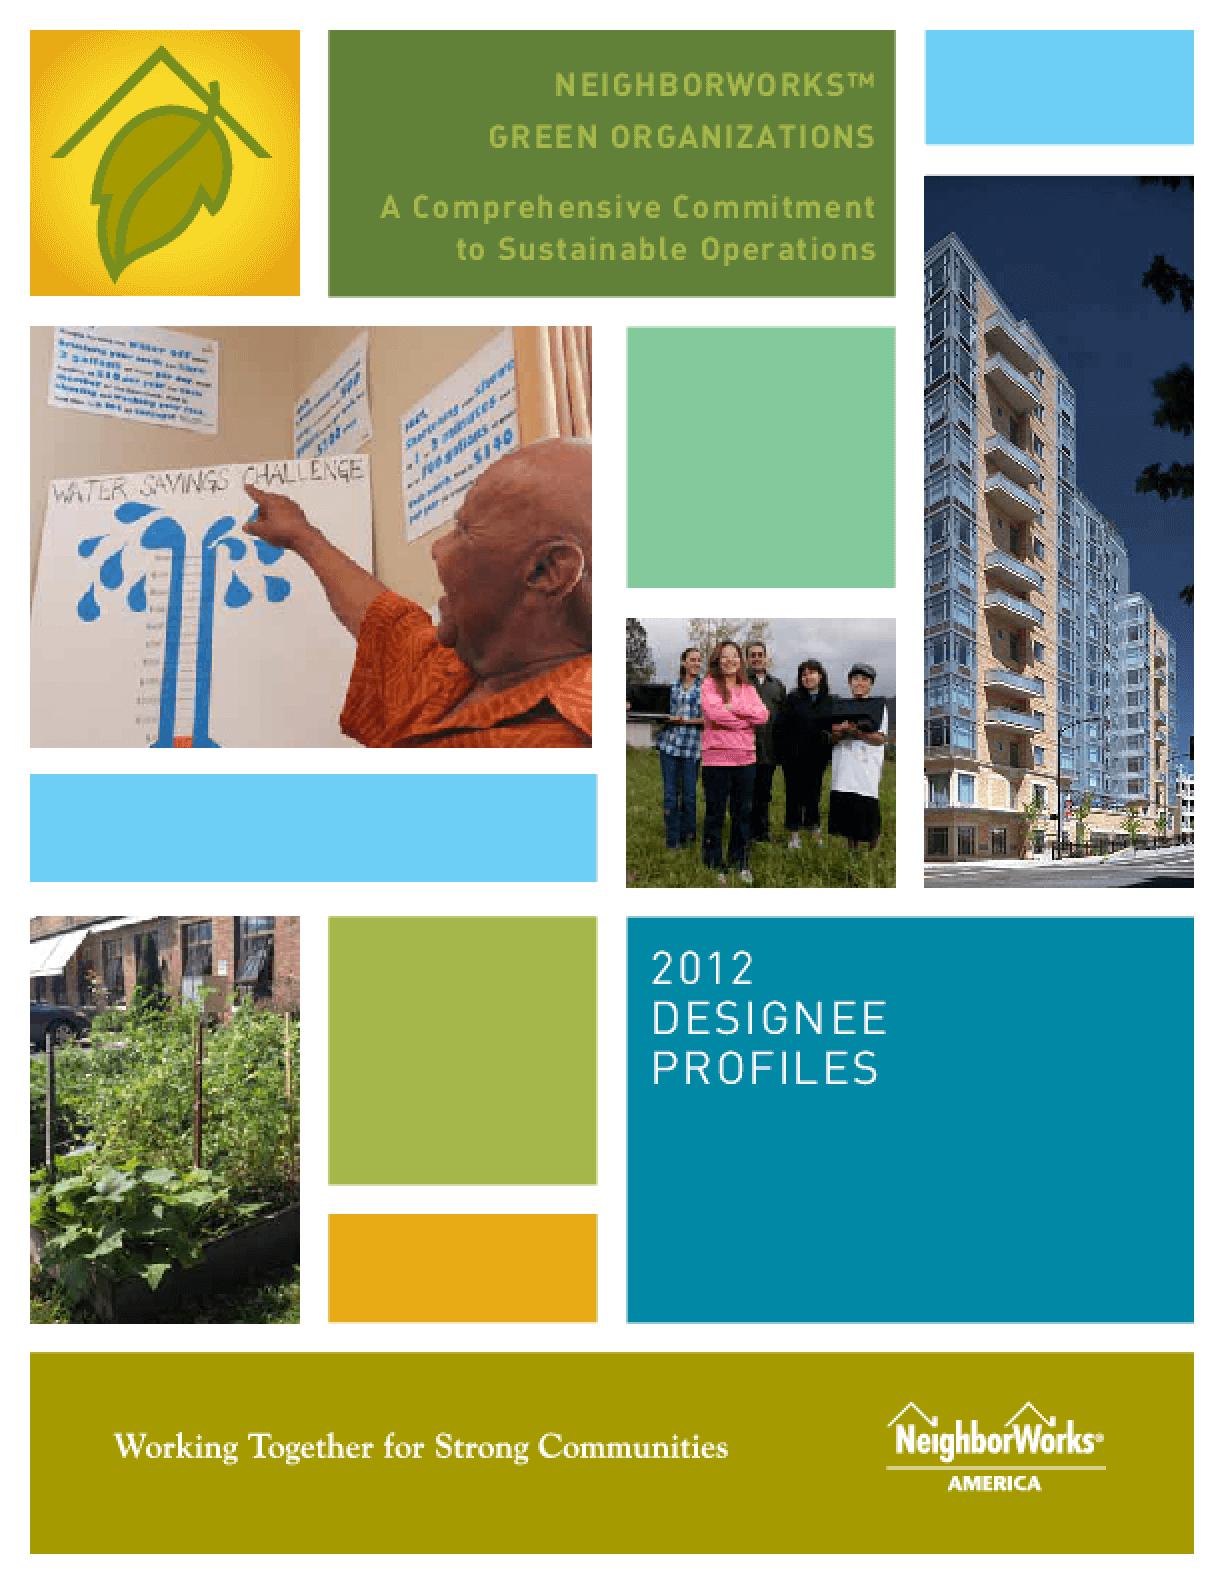 NeighborWorks Green Organizations: 2012 Designee Profiles